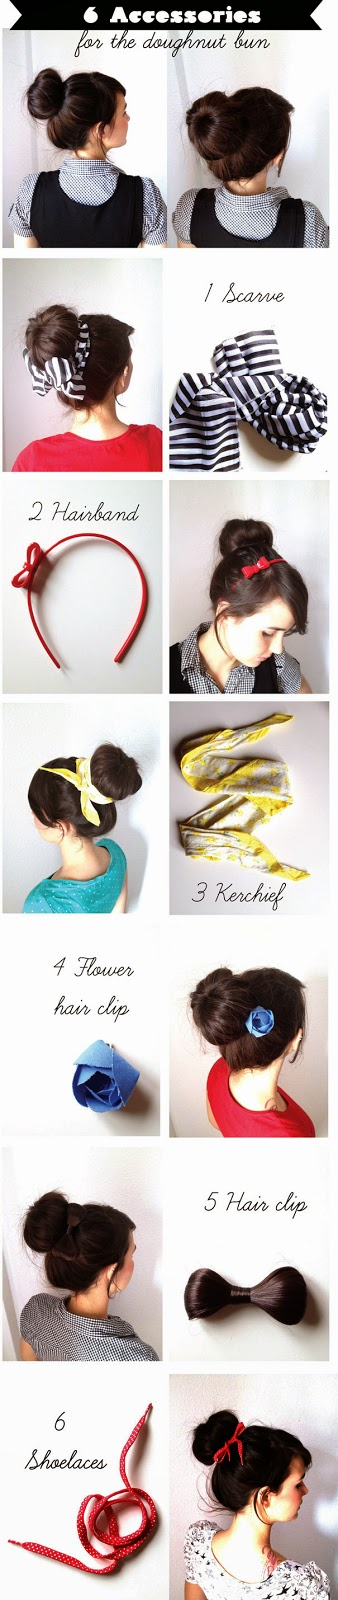 Cara Mengikat Rambut Panjang Ala  Bun Dengan Aksesoris Tambahan